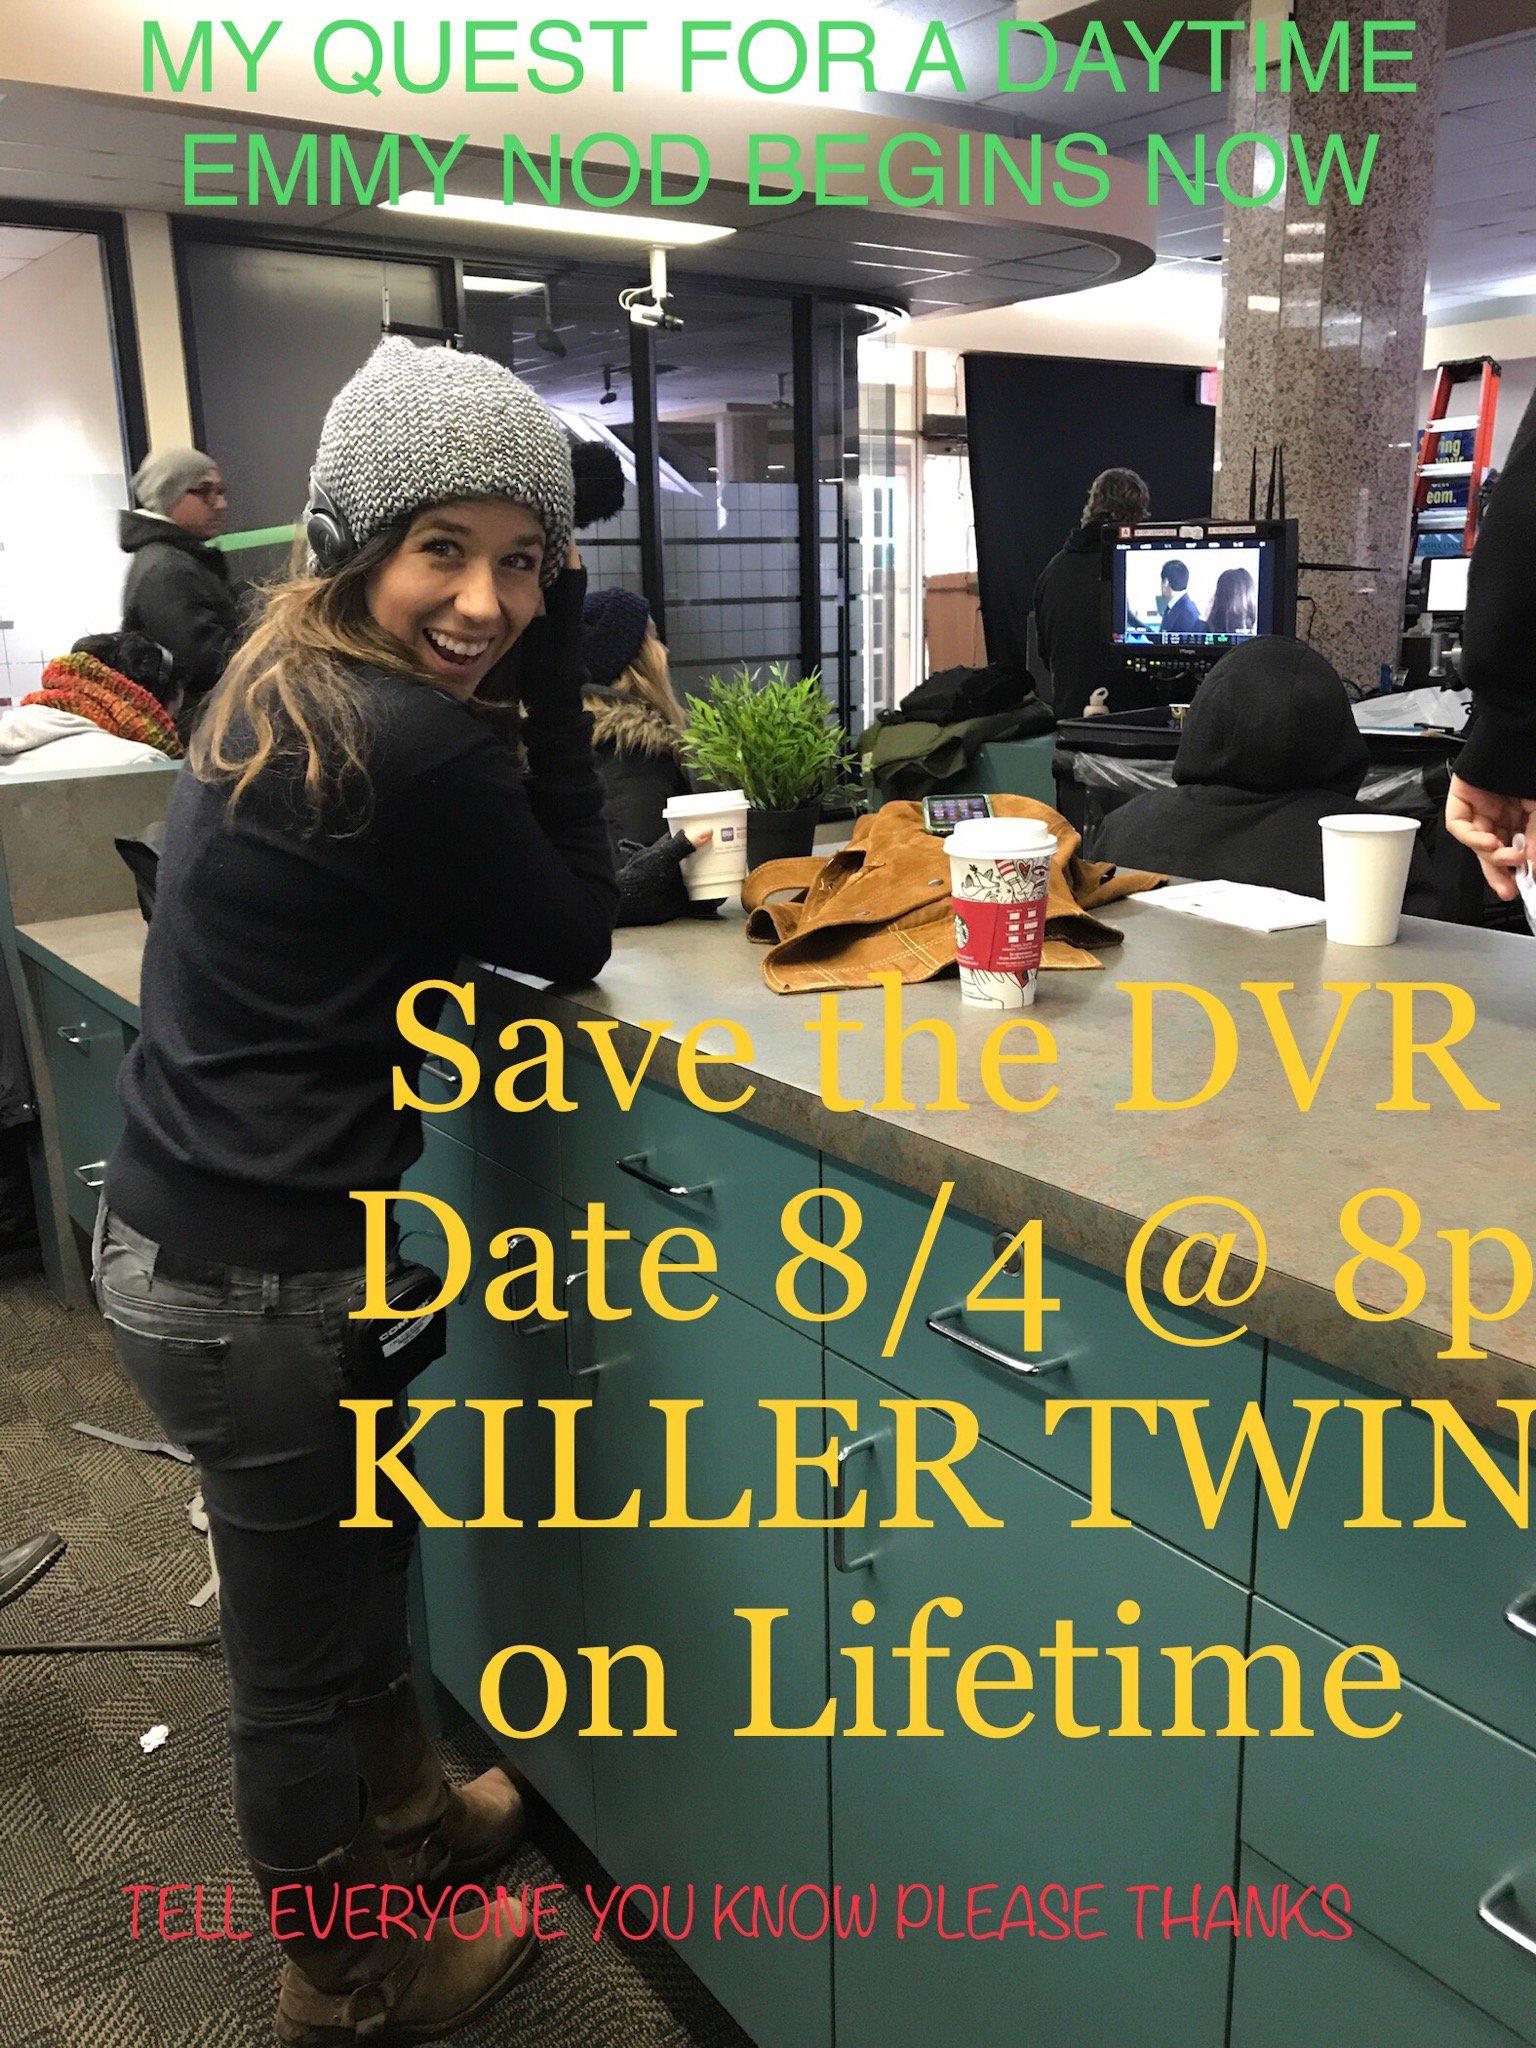 Killer Twin Lifetime : killer, lifetime, Jenna, Brister, Twitter:, @lifetimetv, People, Formulaic, Thrillers, Brilliant, Actors, Please, Retweet!, Thank, 😎…, Https://t.co/igBz0TIBUy